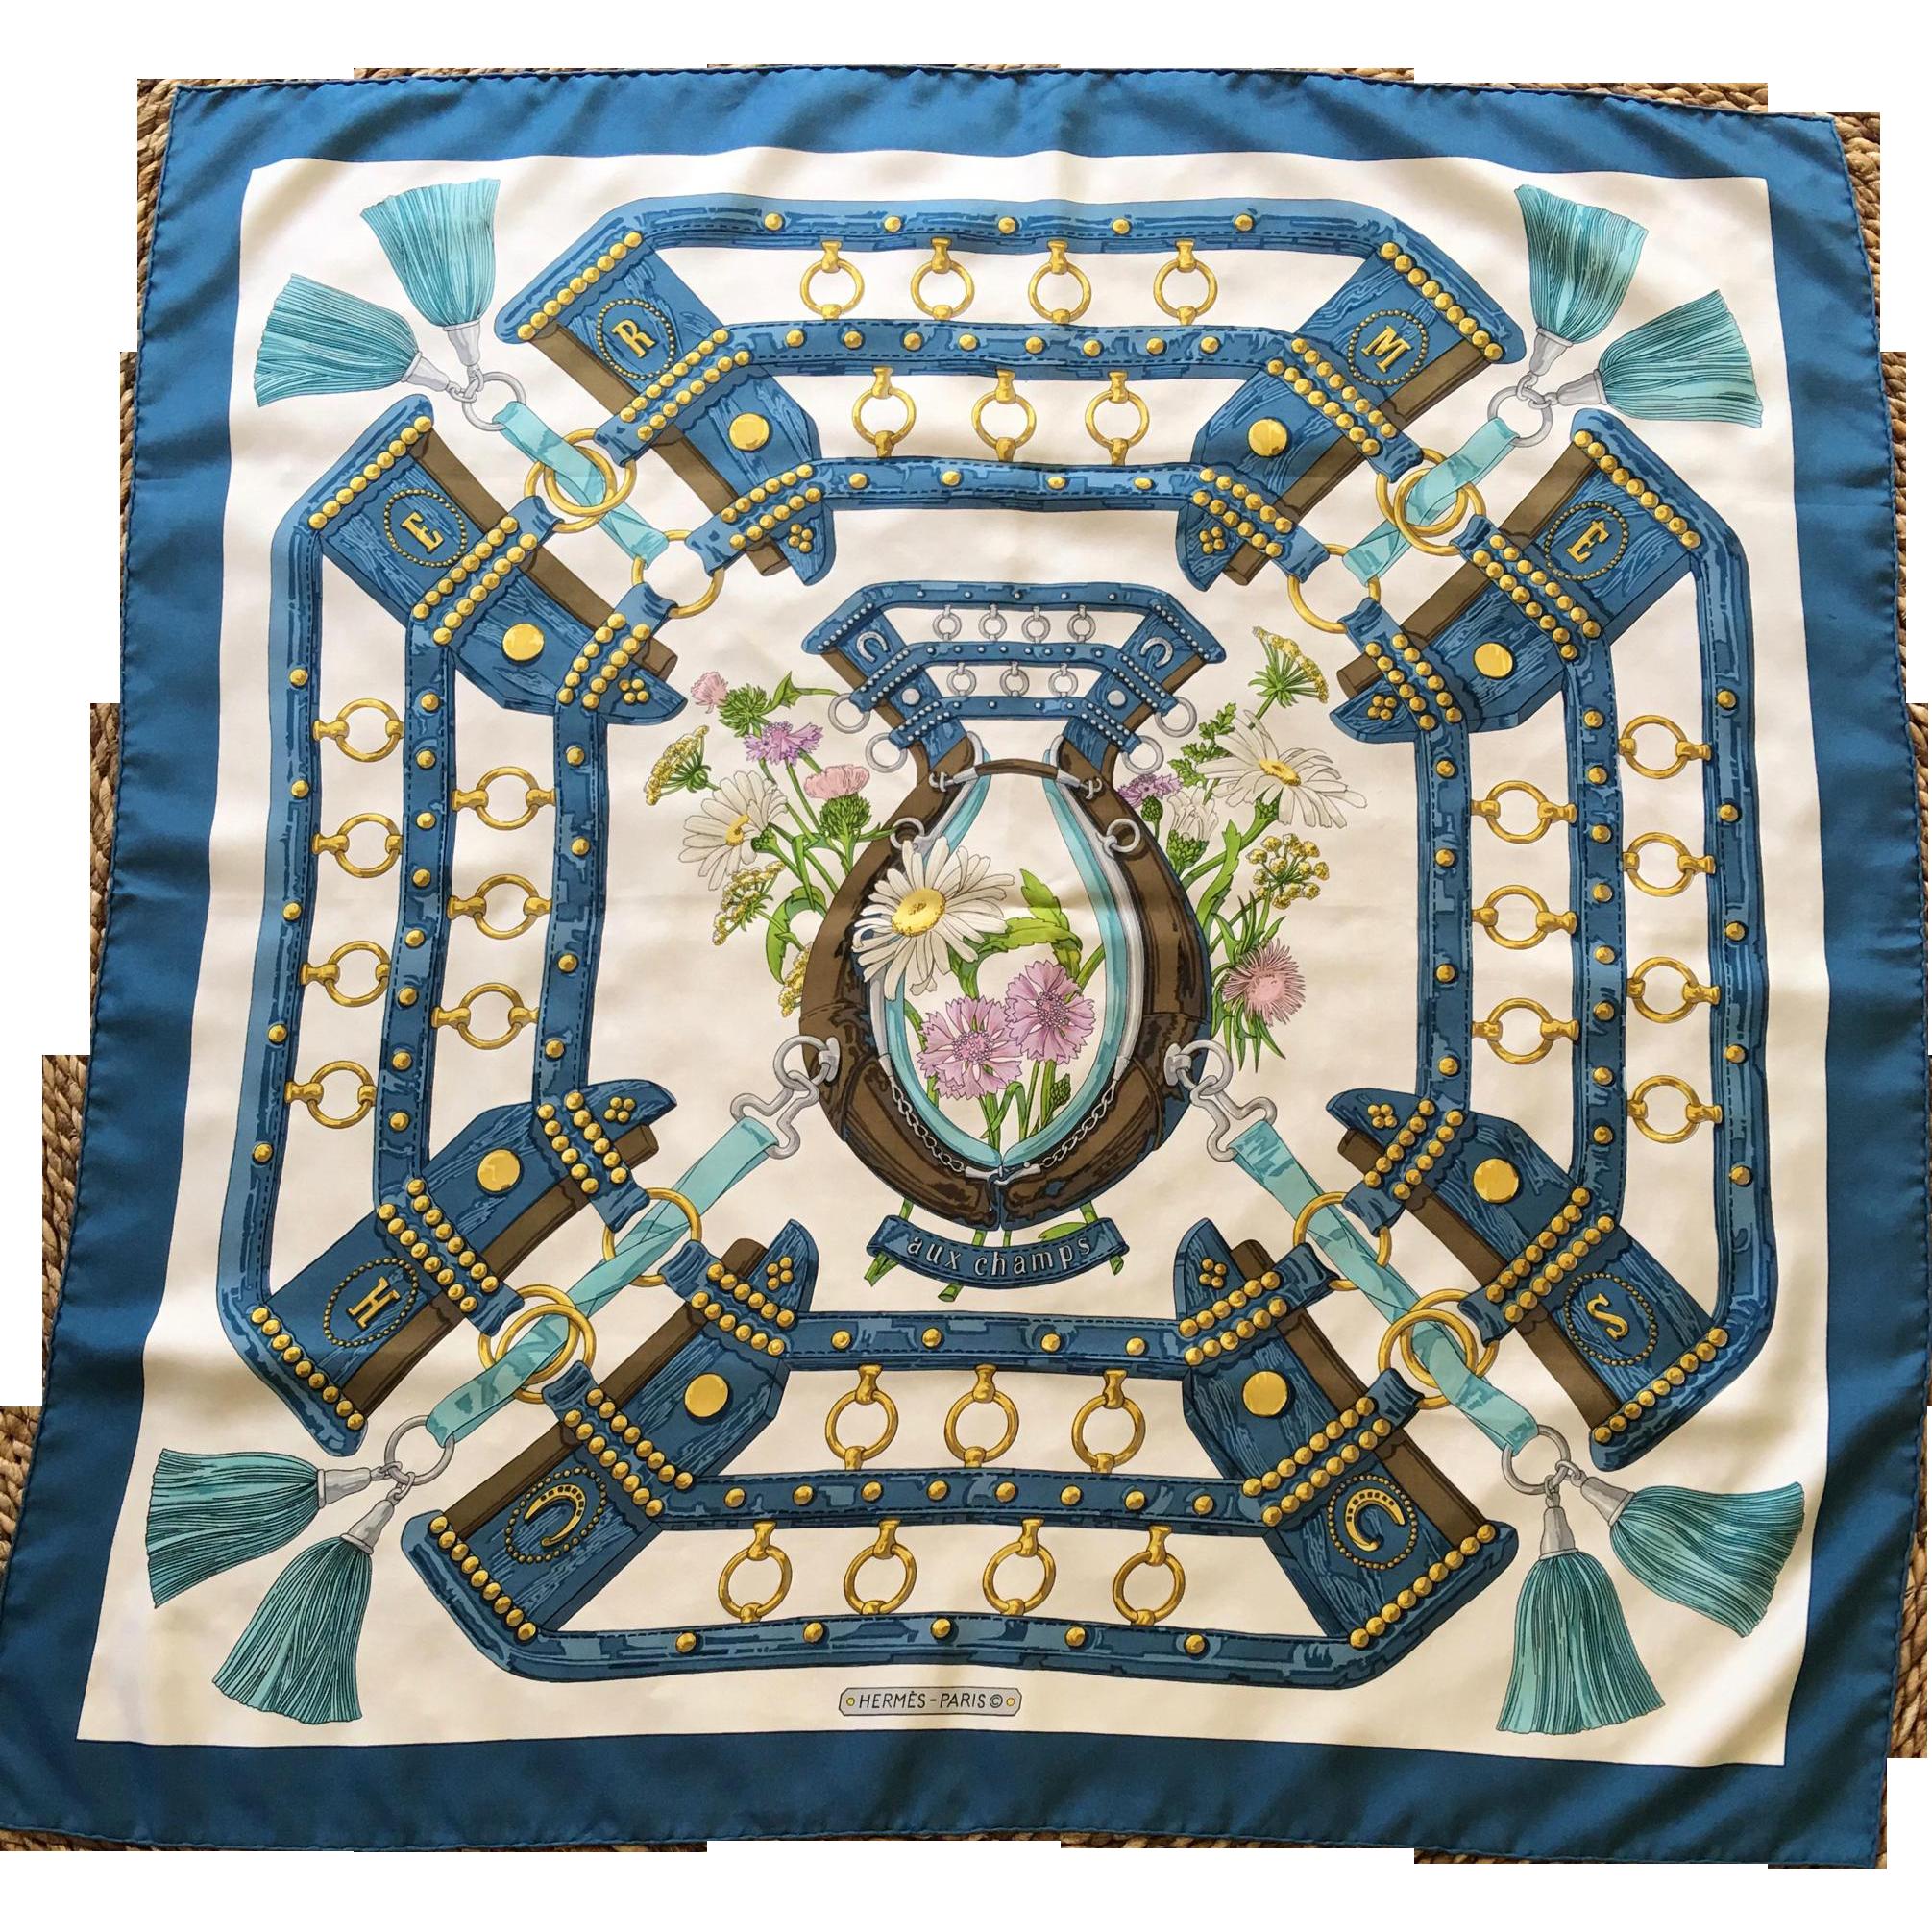 Vintage hermes paris aux champs silk scarf the shop on for Jewelry arts prairie village